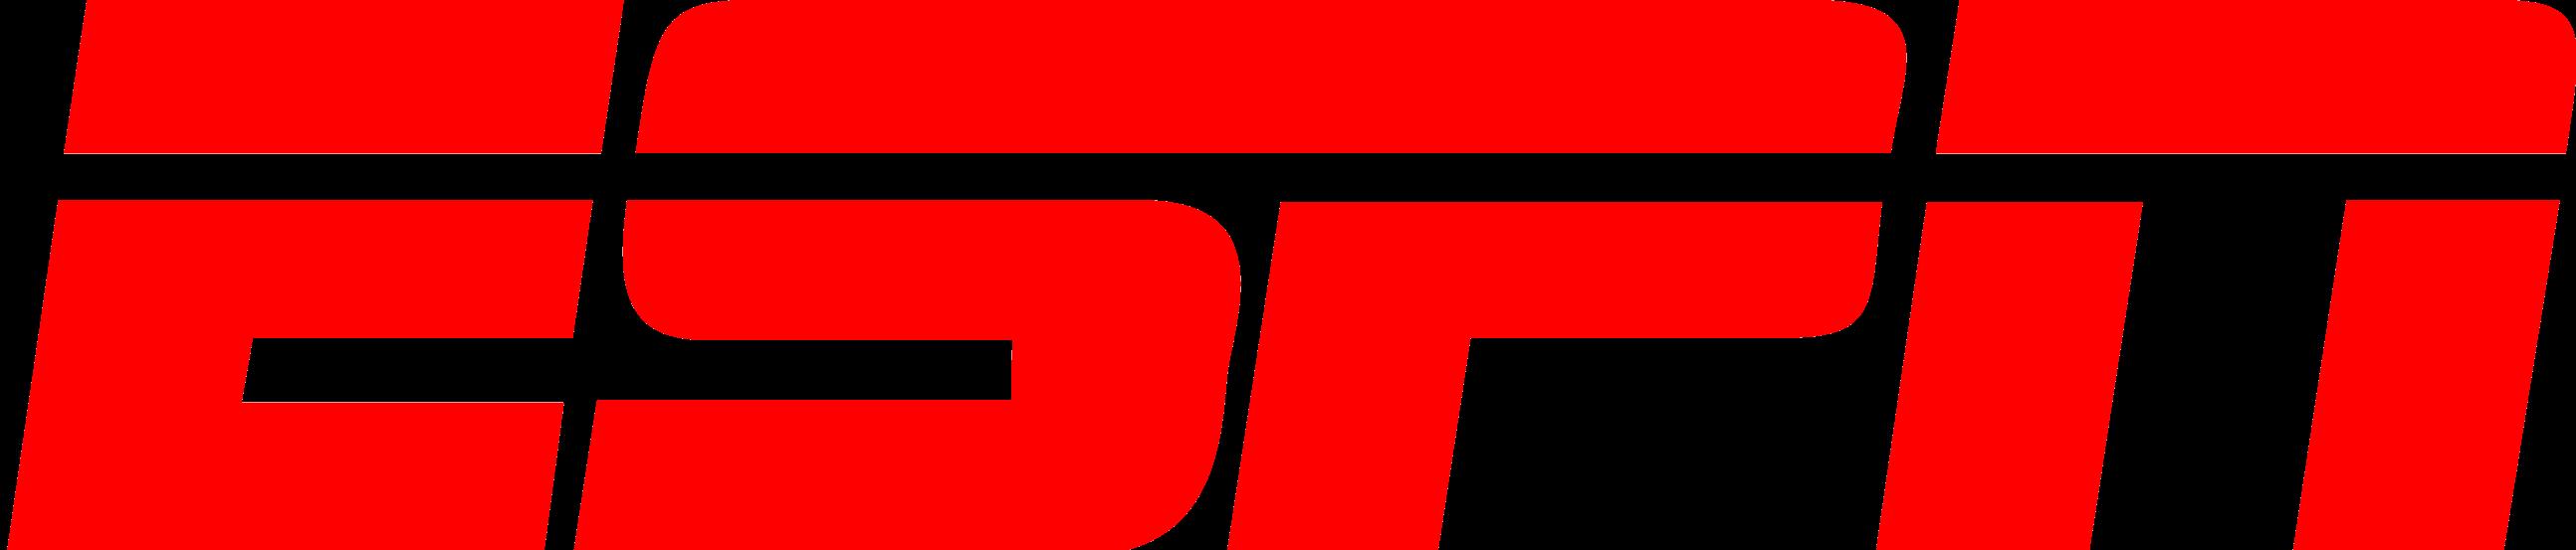 ESPN The Magazine Subscription Logo